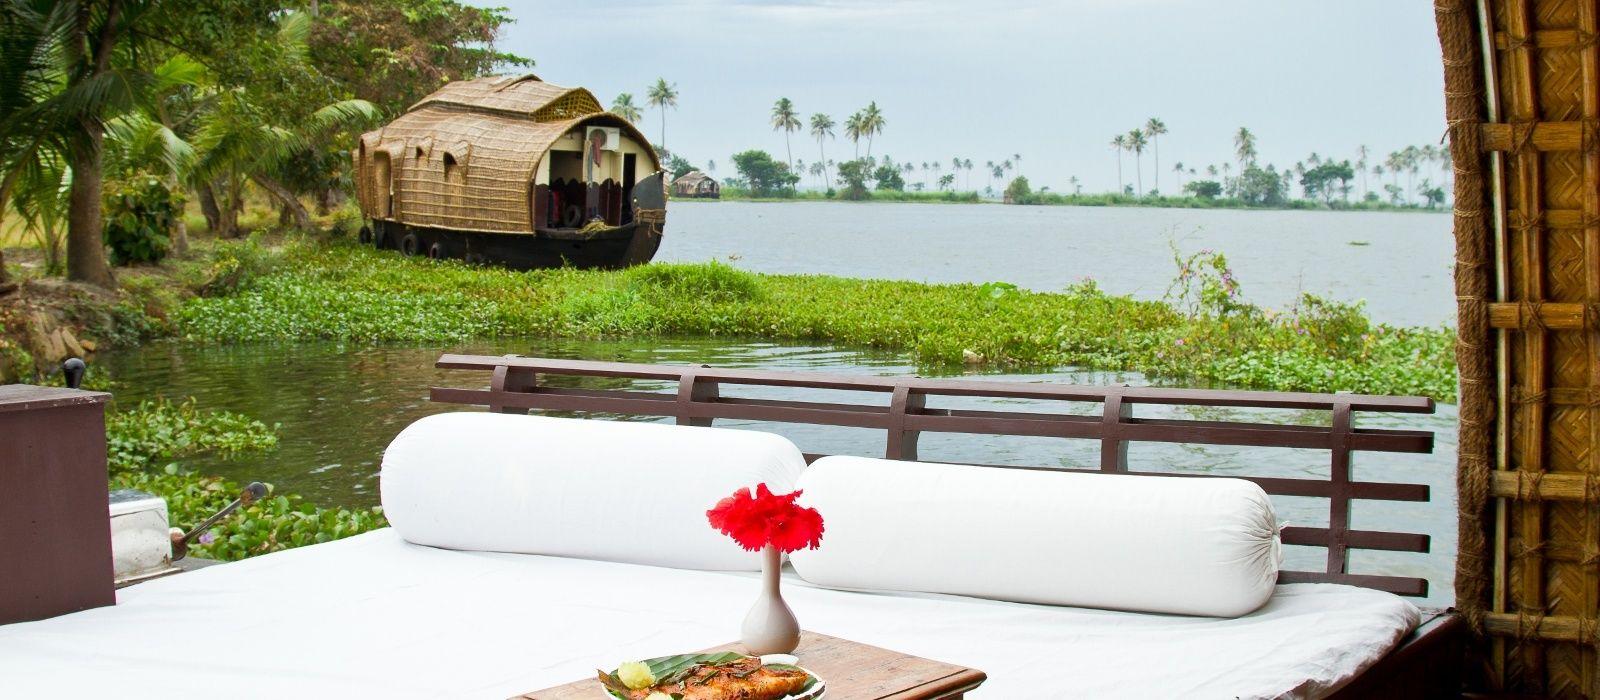 Los canales de Kerala Tour Trip 5